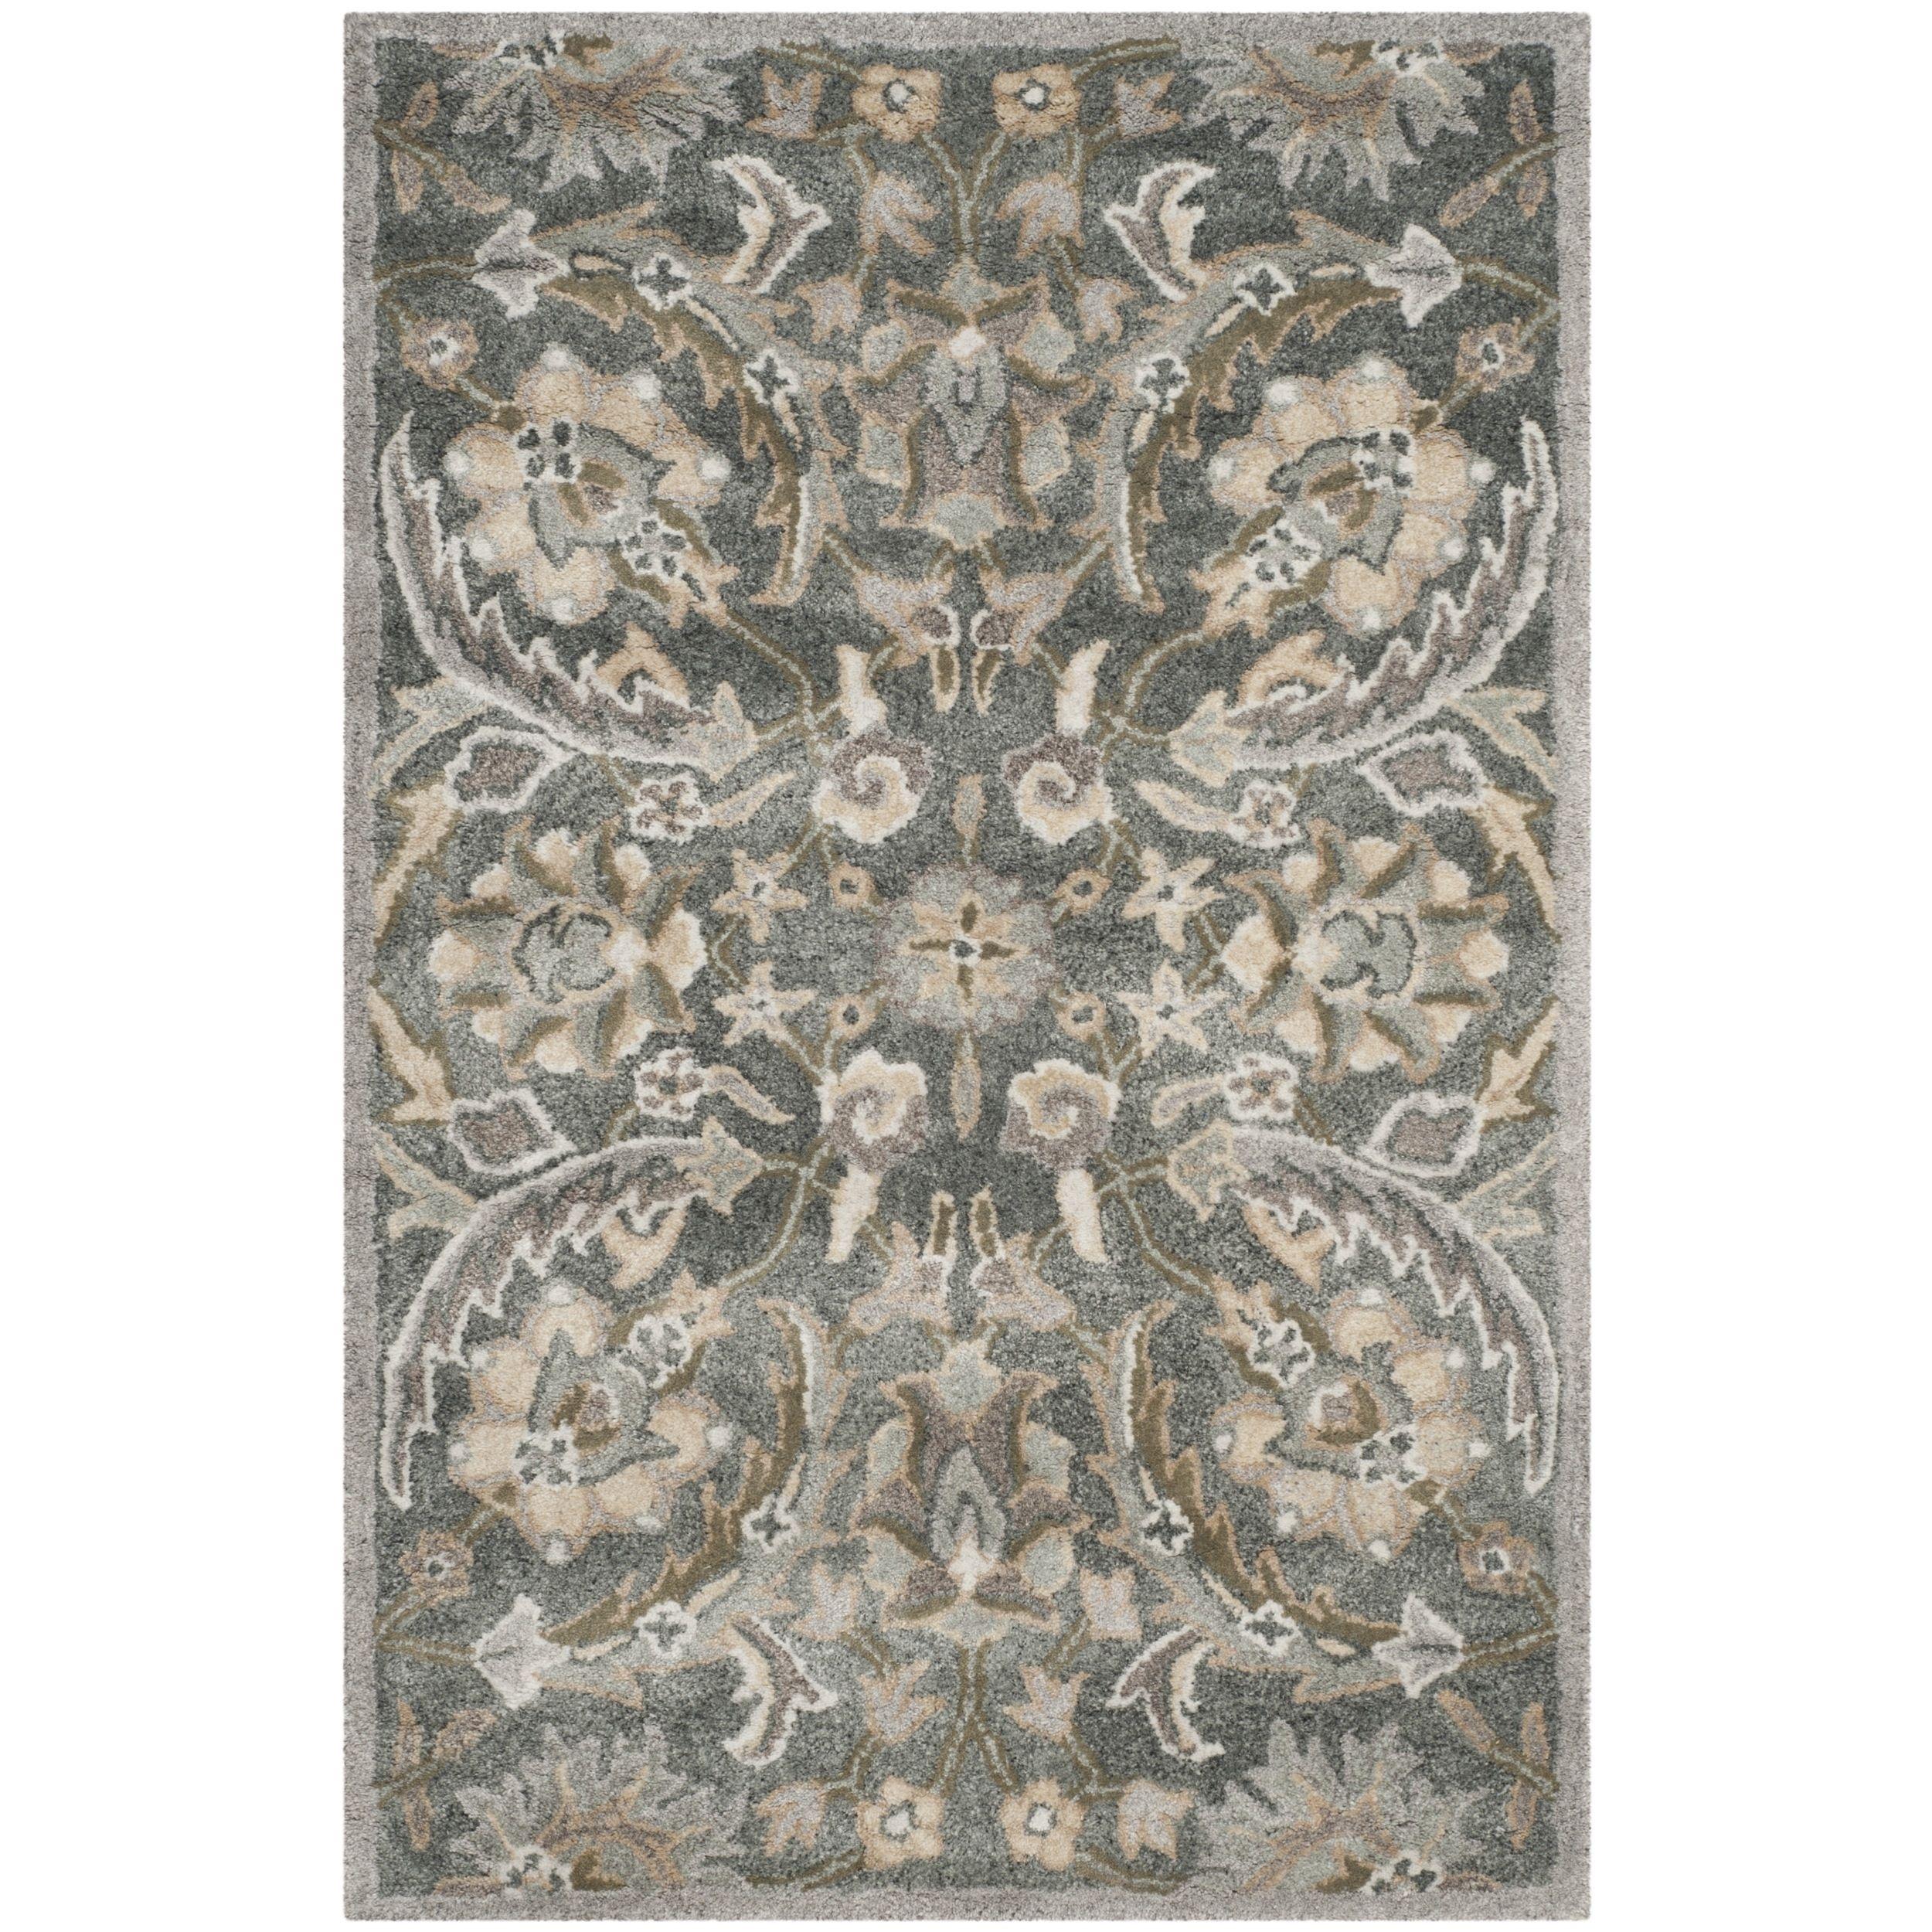 Safavieh Handmade Bella Grey/ Multi Wool Rug (2' 6 x 4') (BEL923B-24), Size 2' x 4'